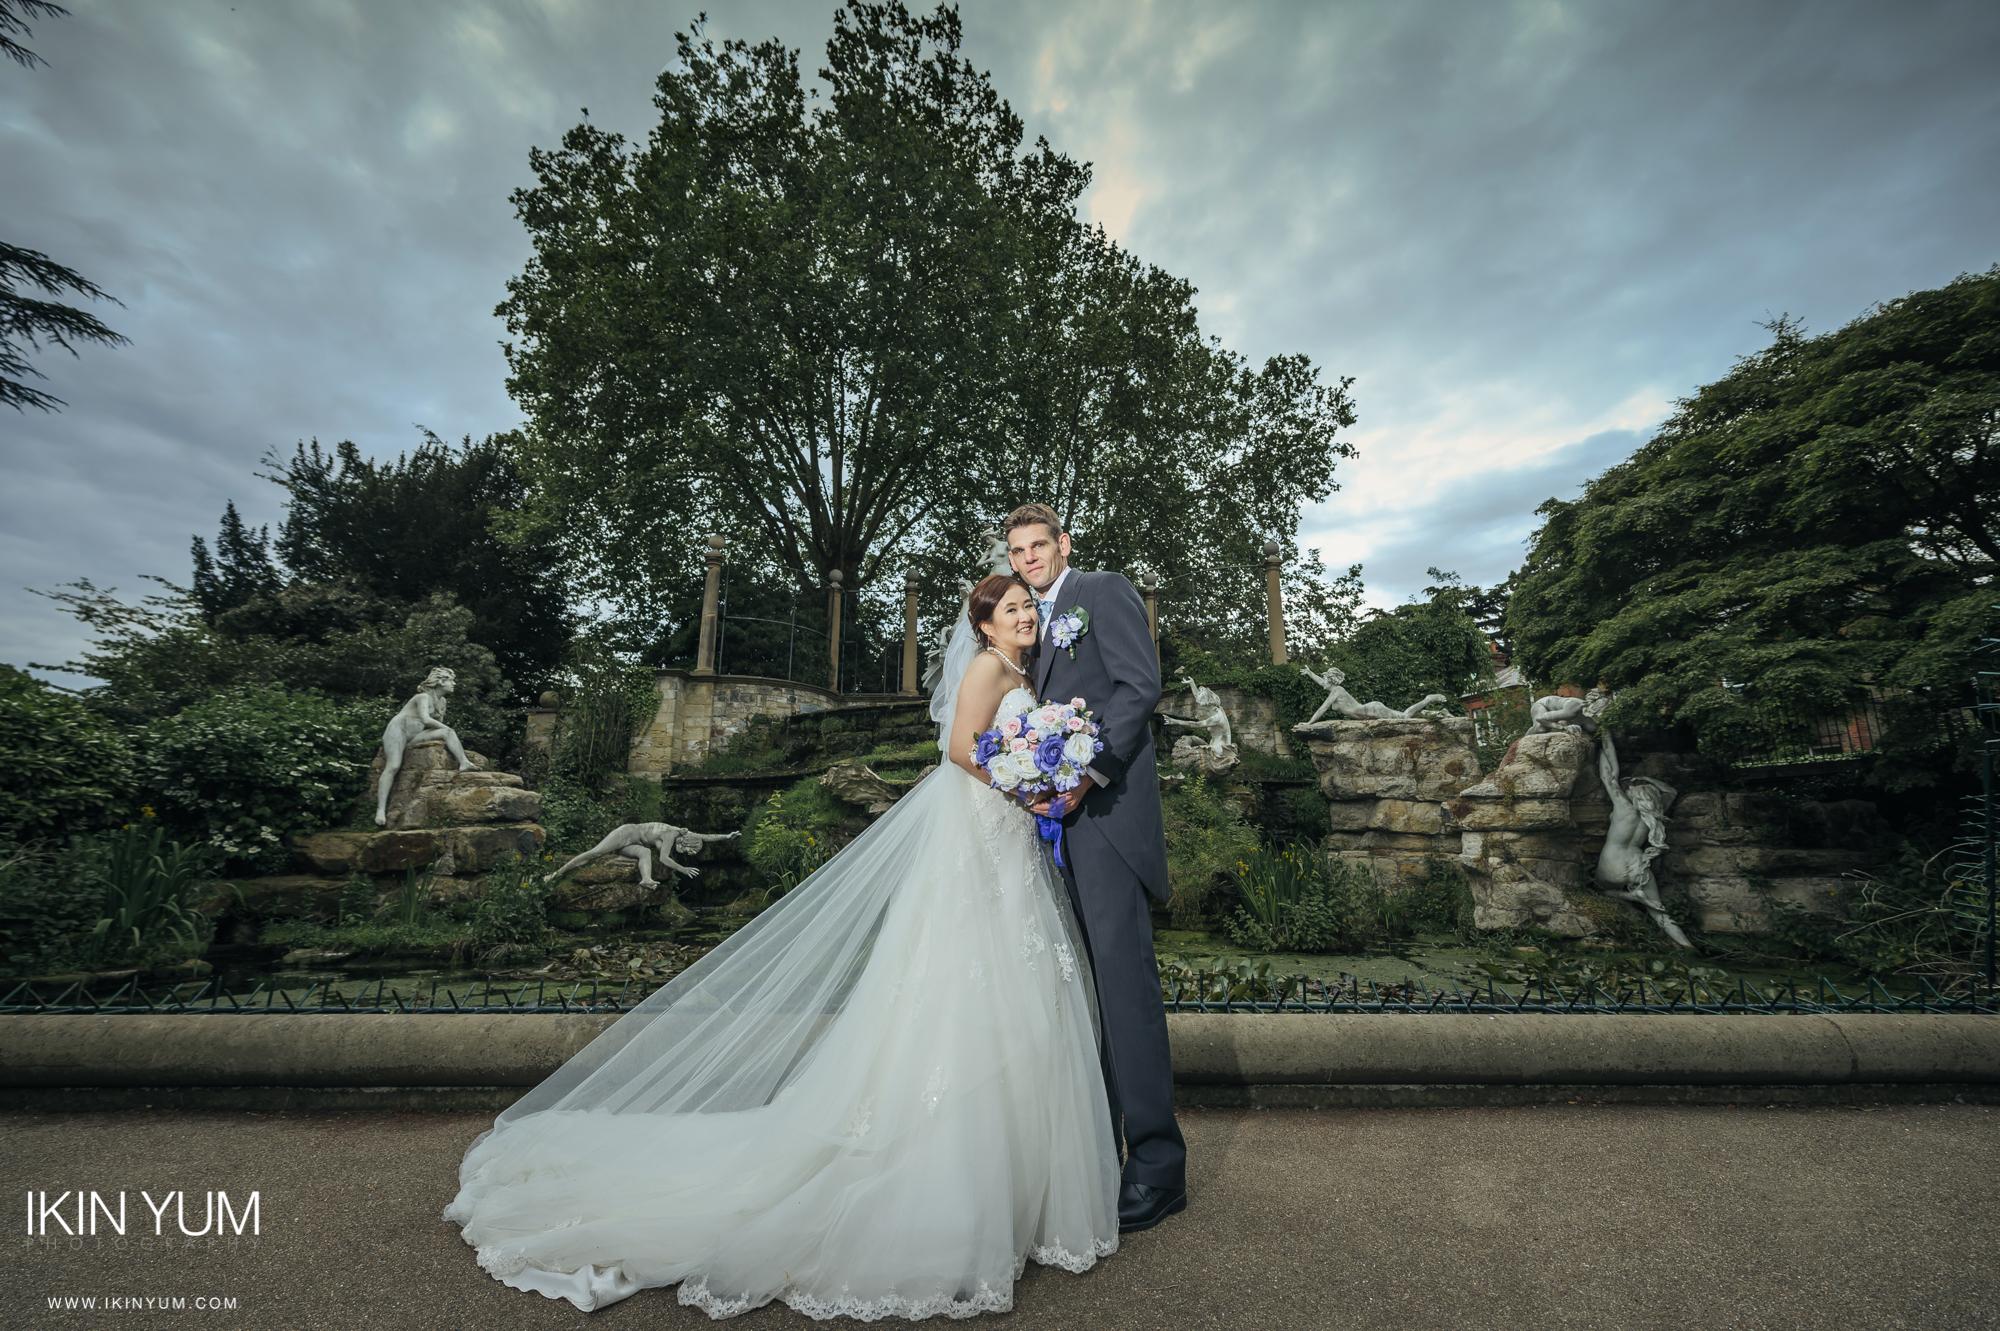 Teresa & Johnathan Weddong Day - Couple Photoshoot-0057.jpg